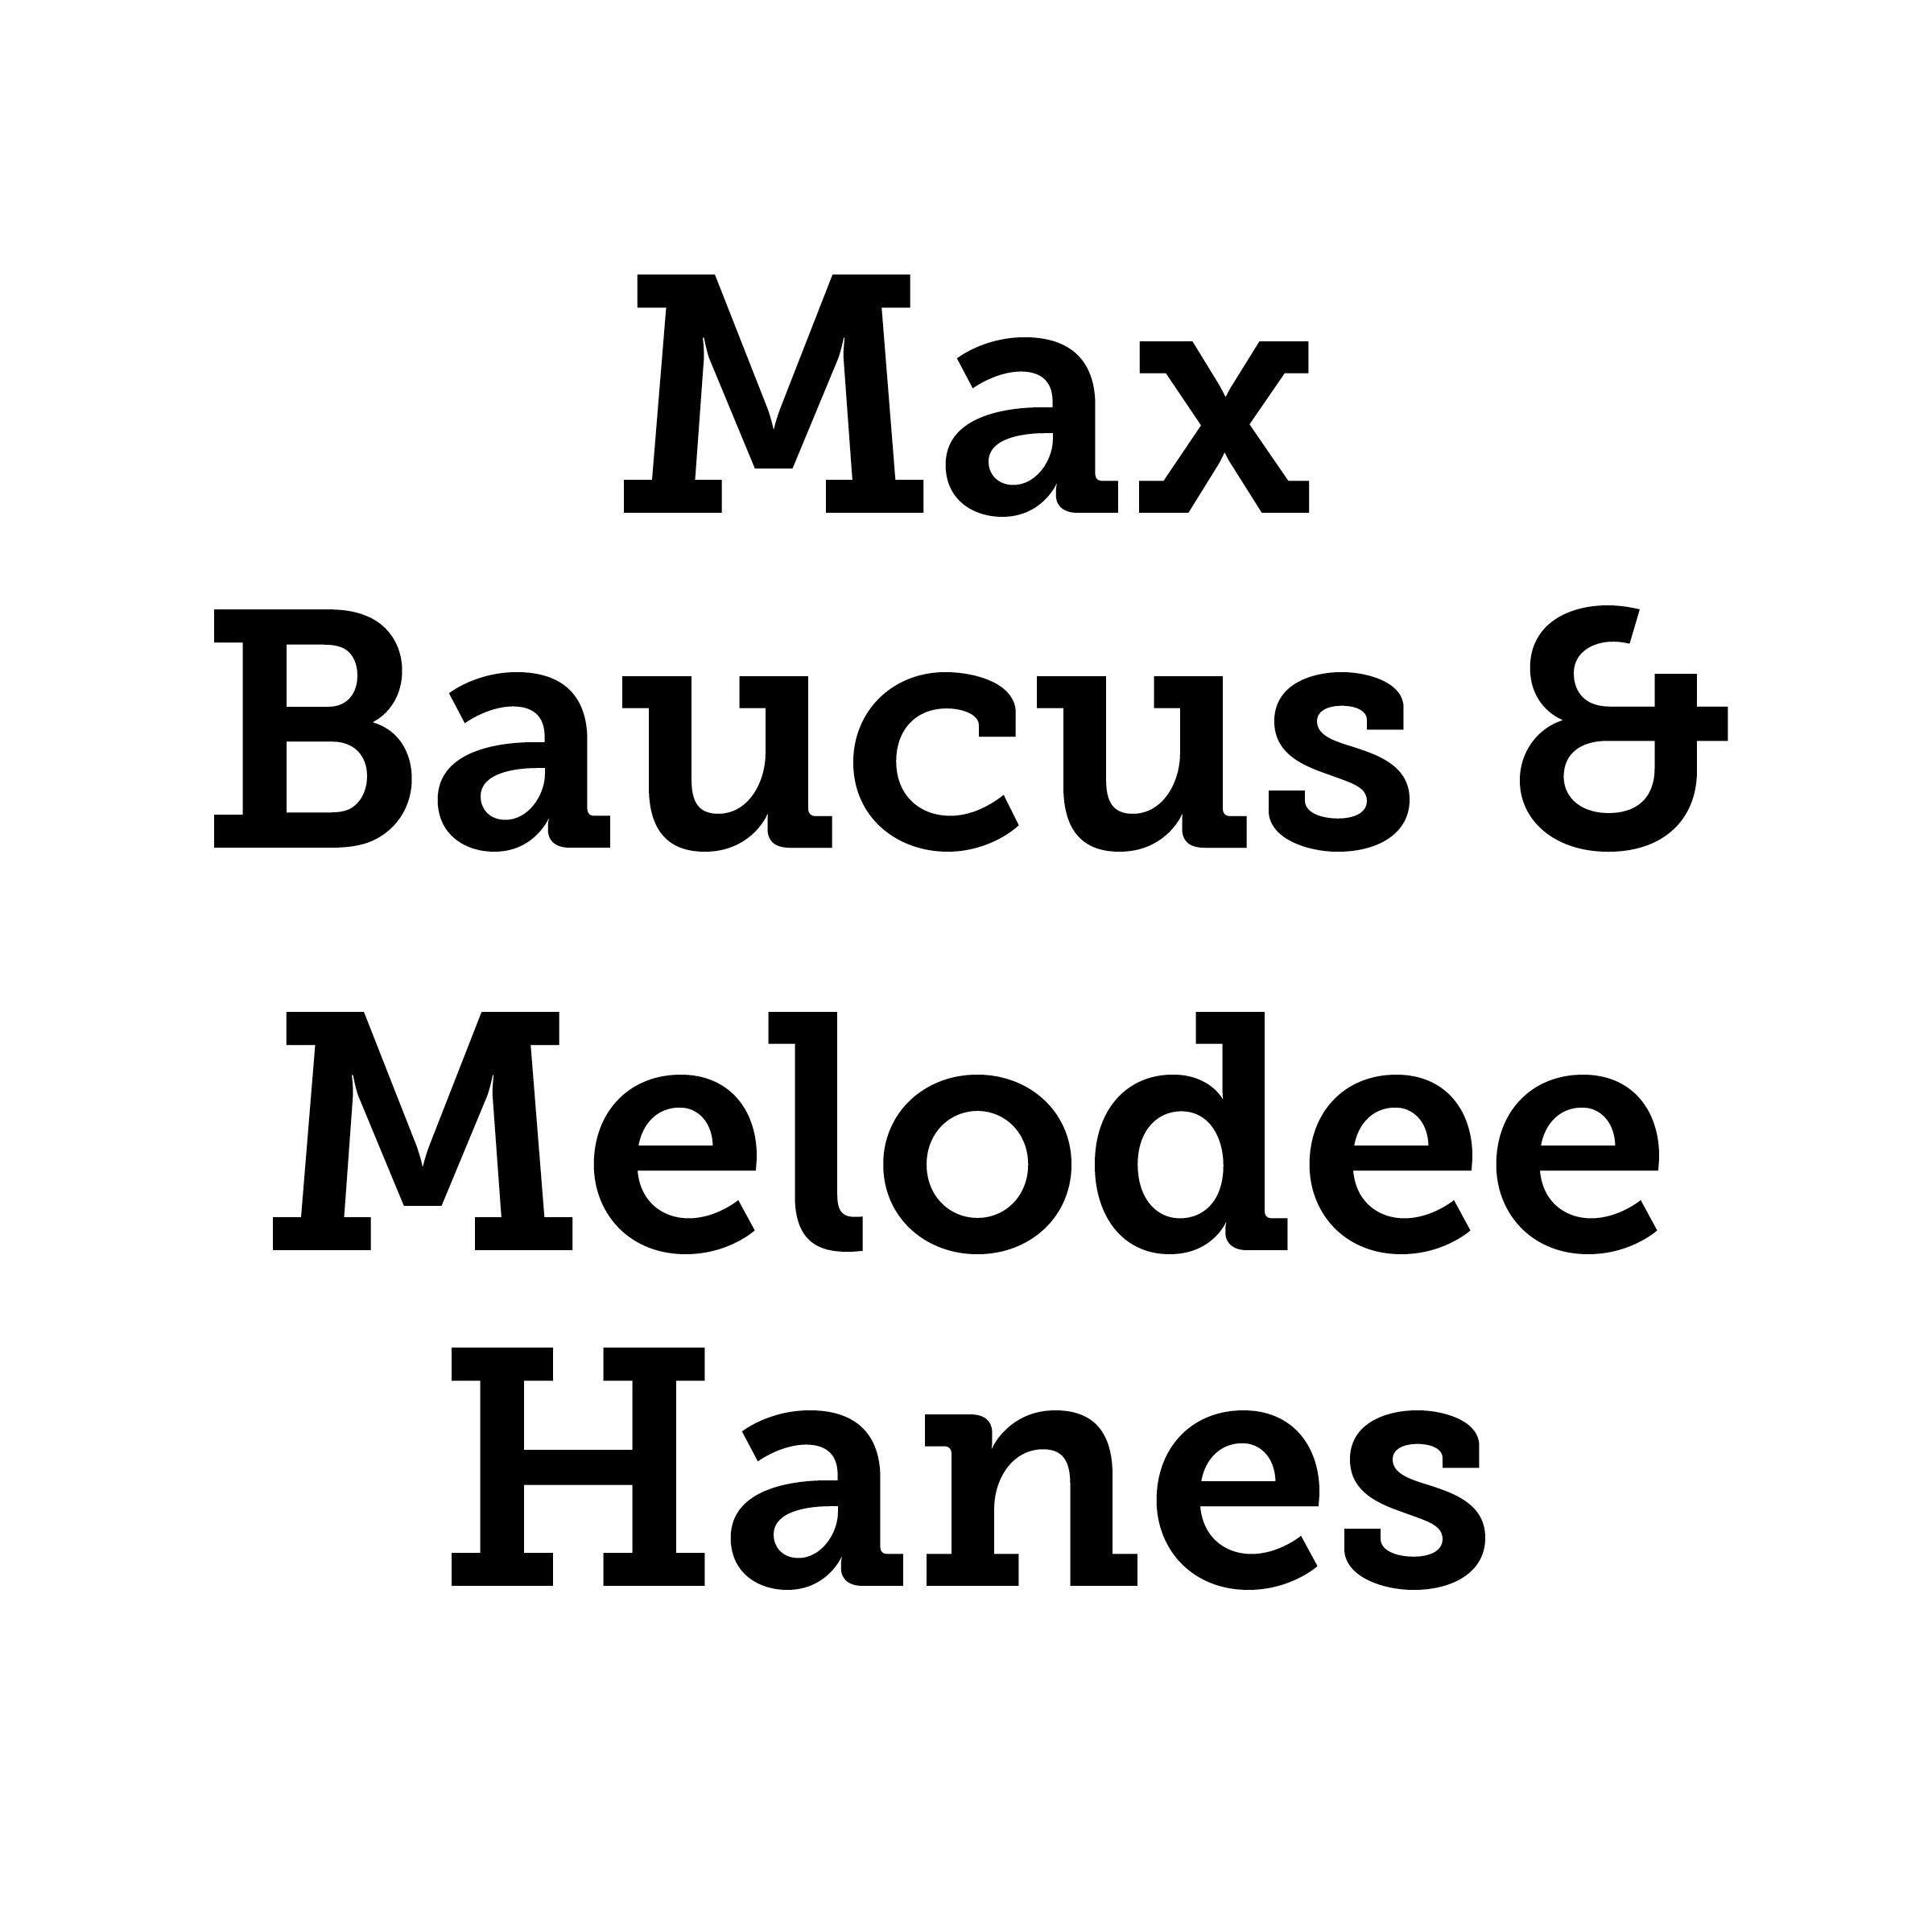 Max Baucus & Melodee Hanes